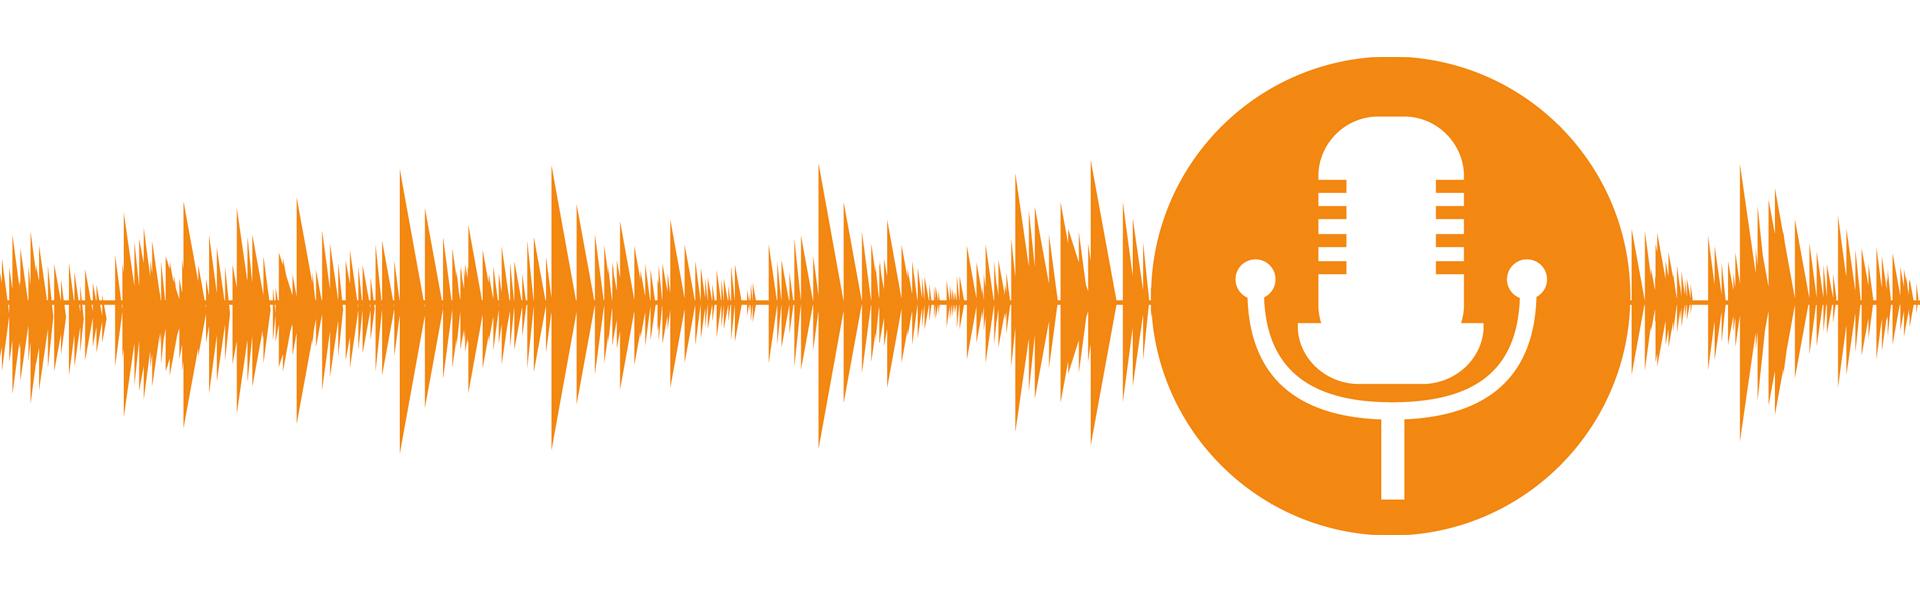 podcast orvesto konsument